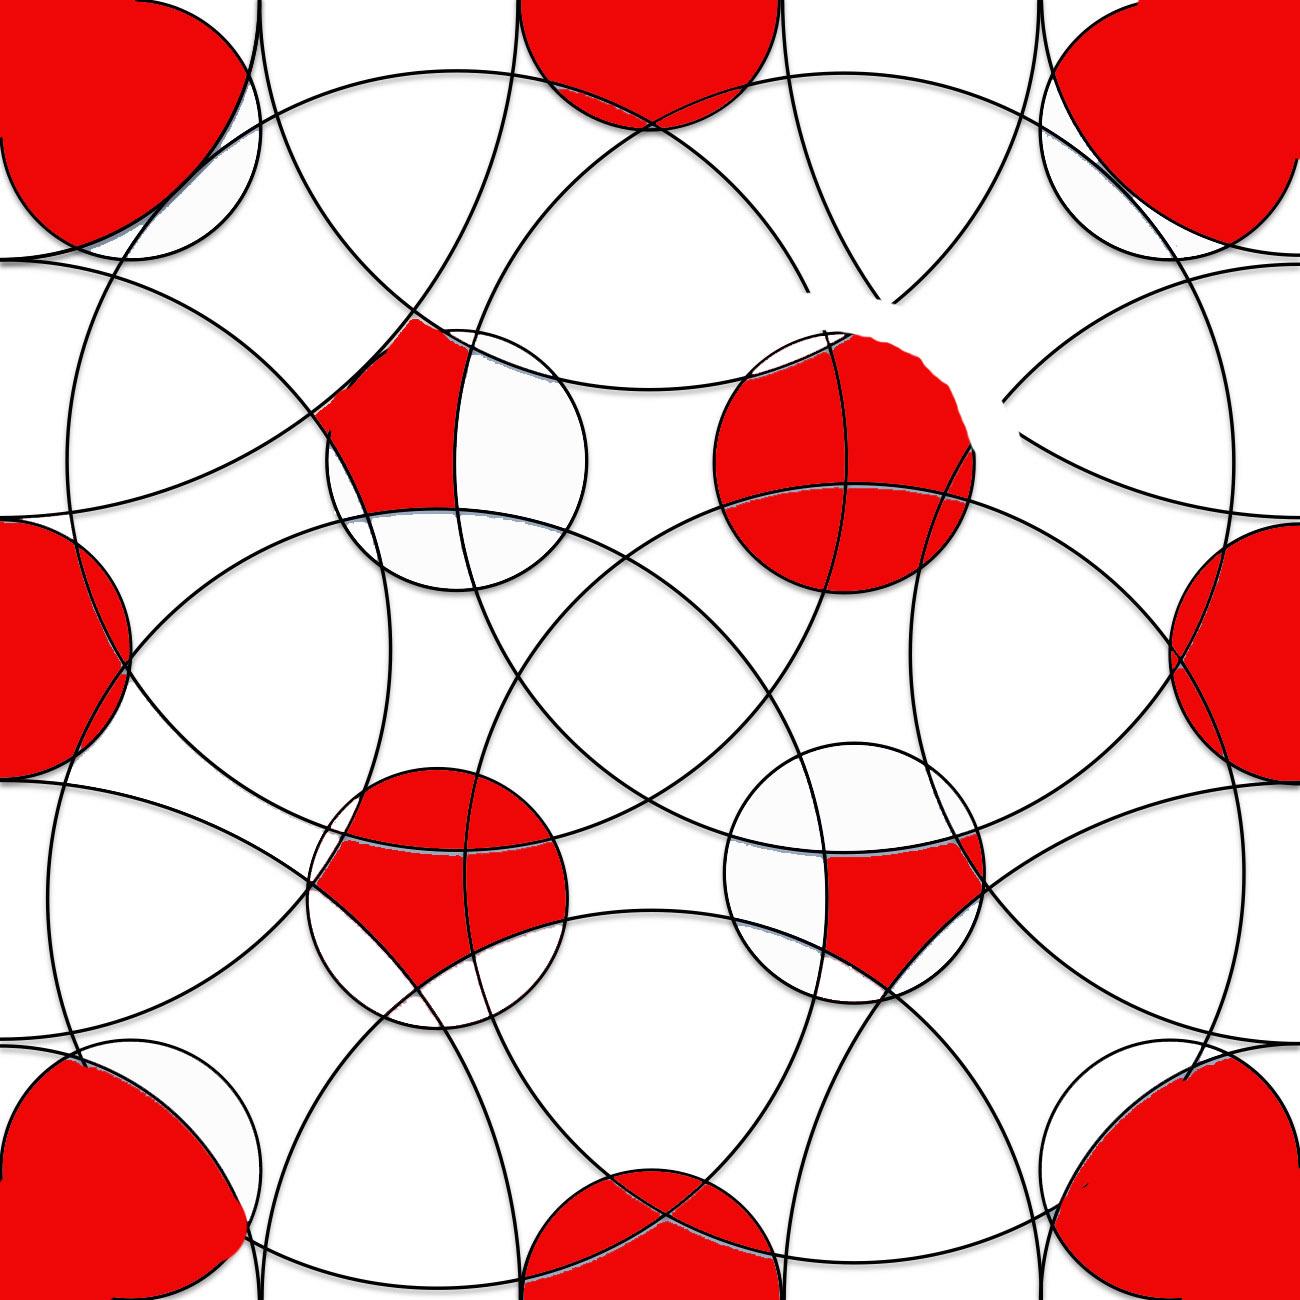 http://www.prise2tete.fr/upload/nobodydy-gateau88.jpg